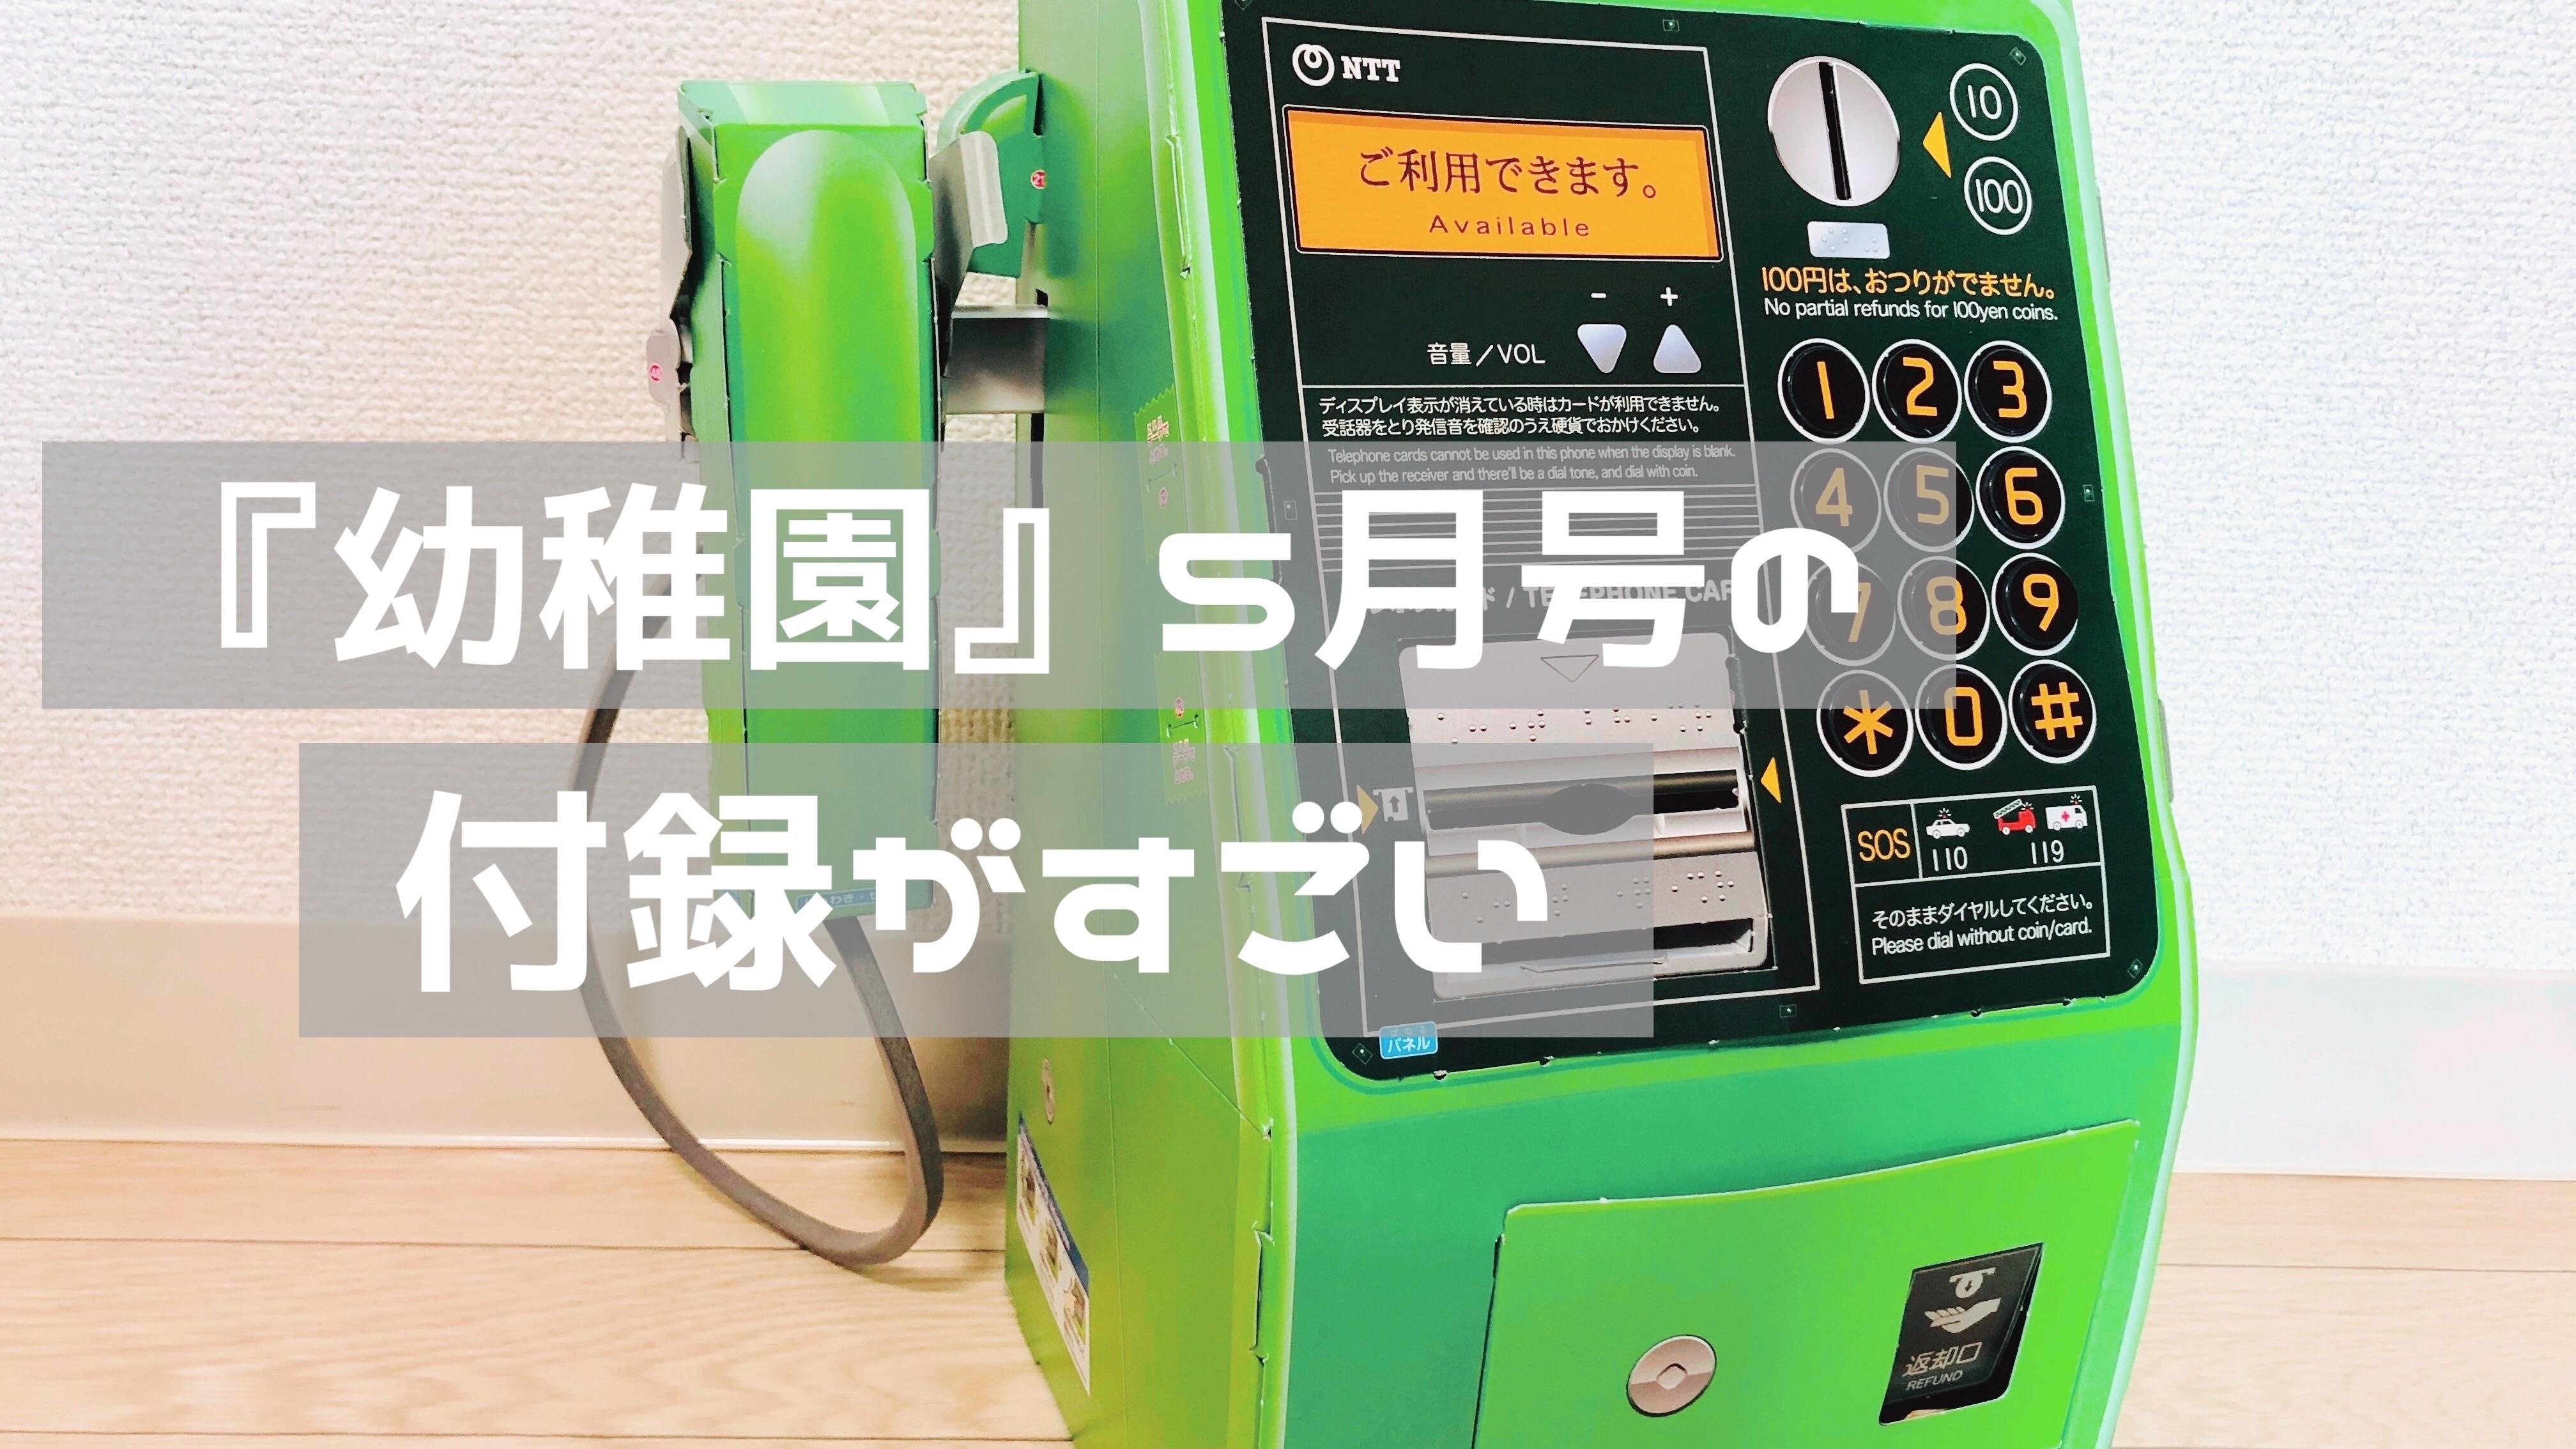 f:id:norimono-chiiku:20200403164007j:image